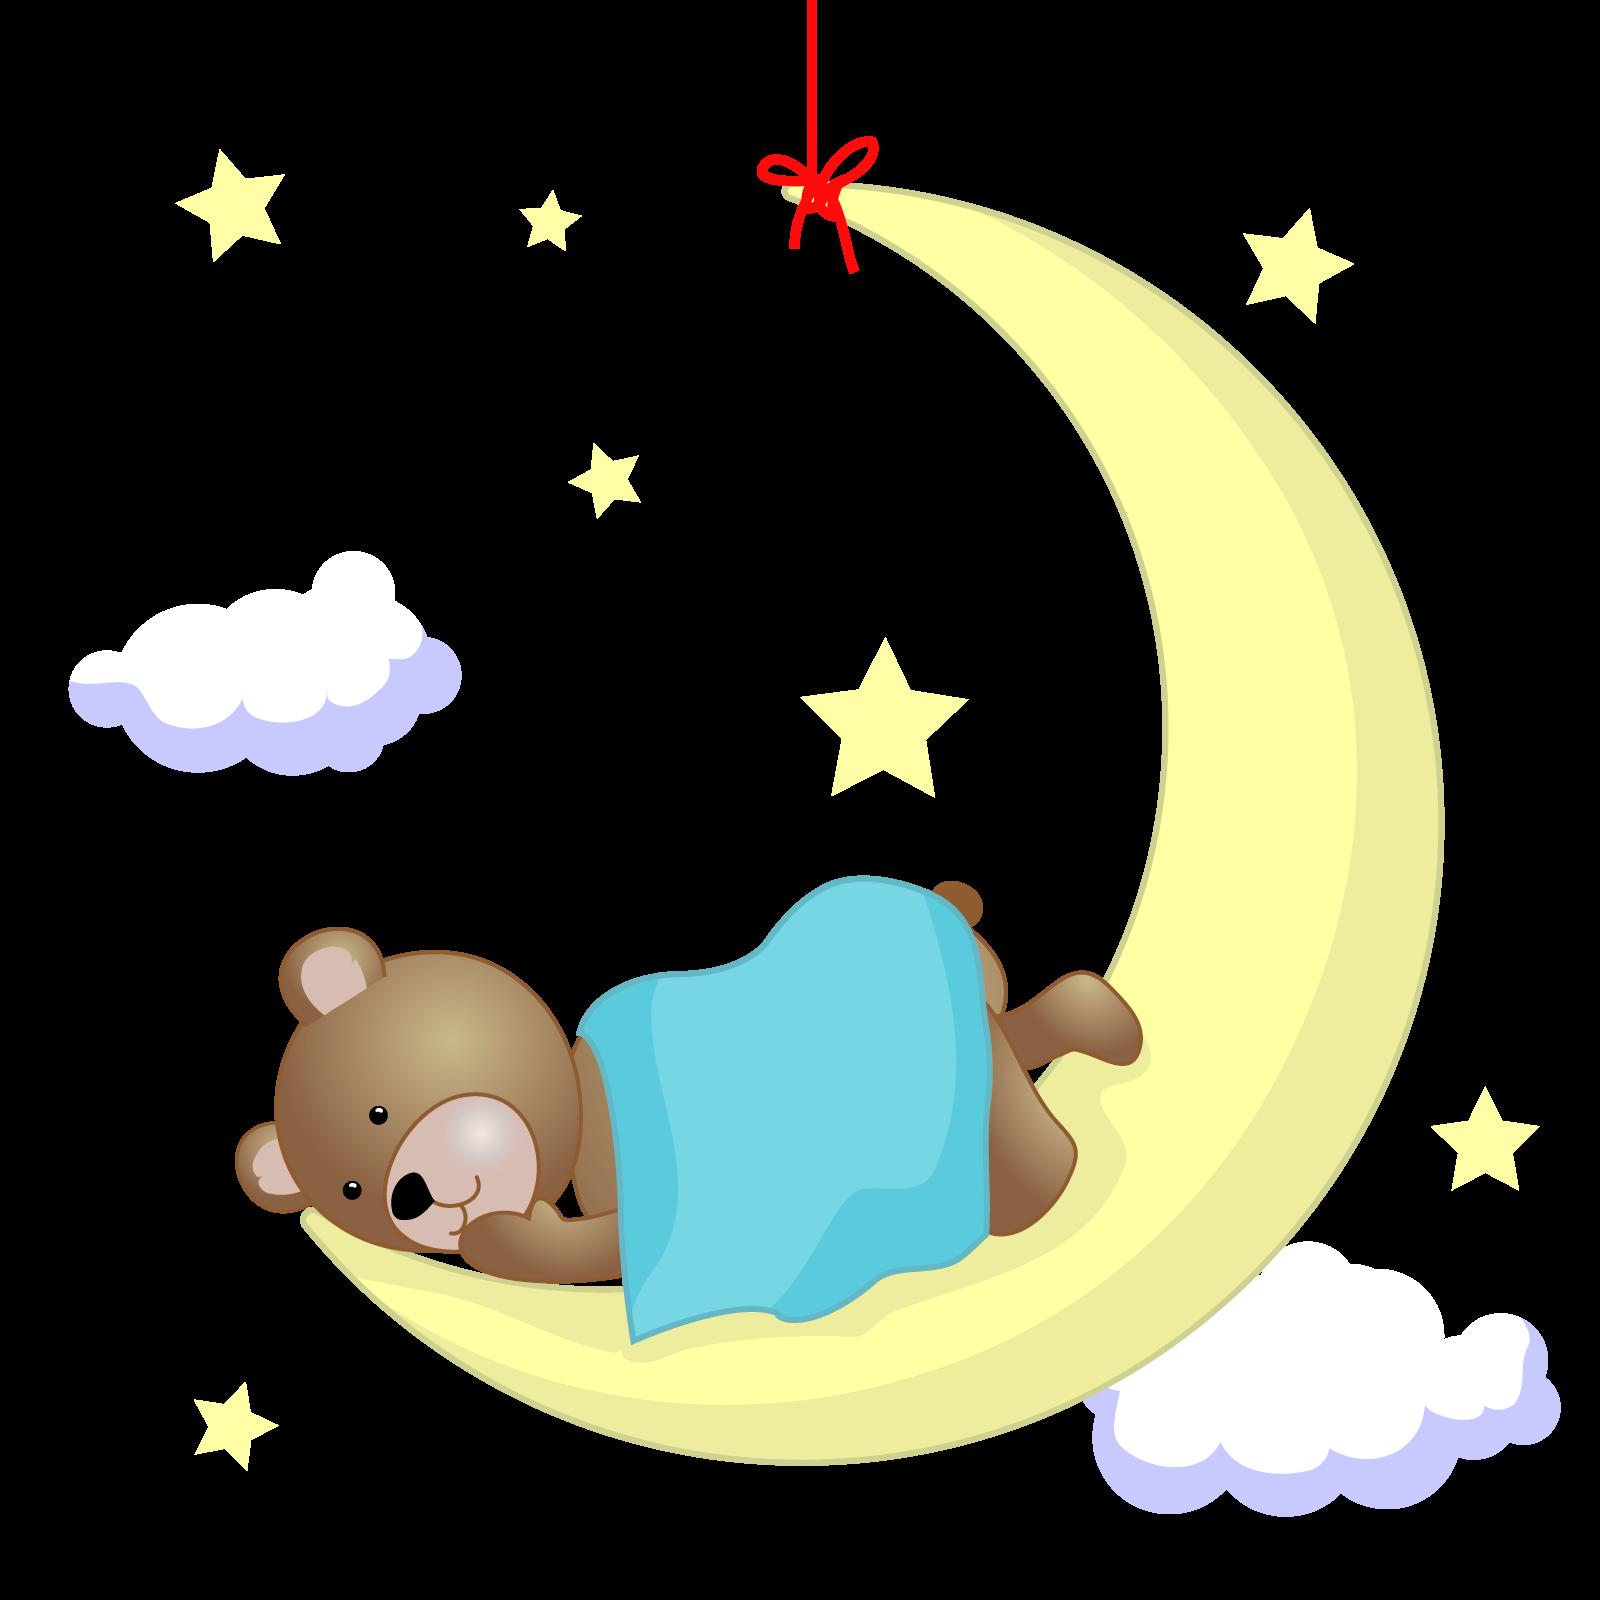 Teddy bear clip art. Night clipart good night